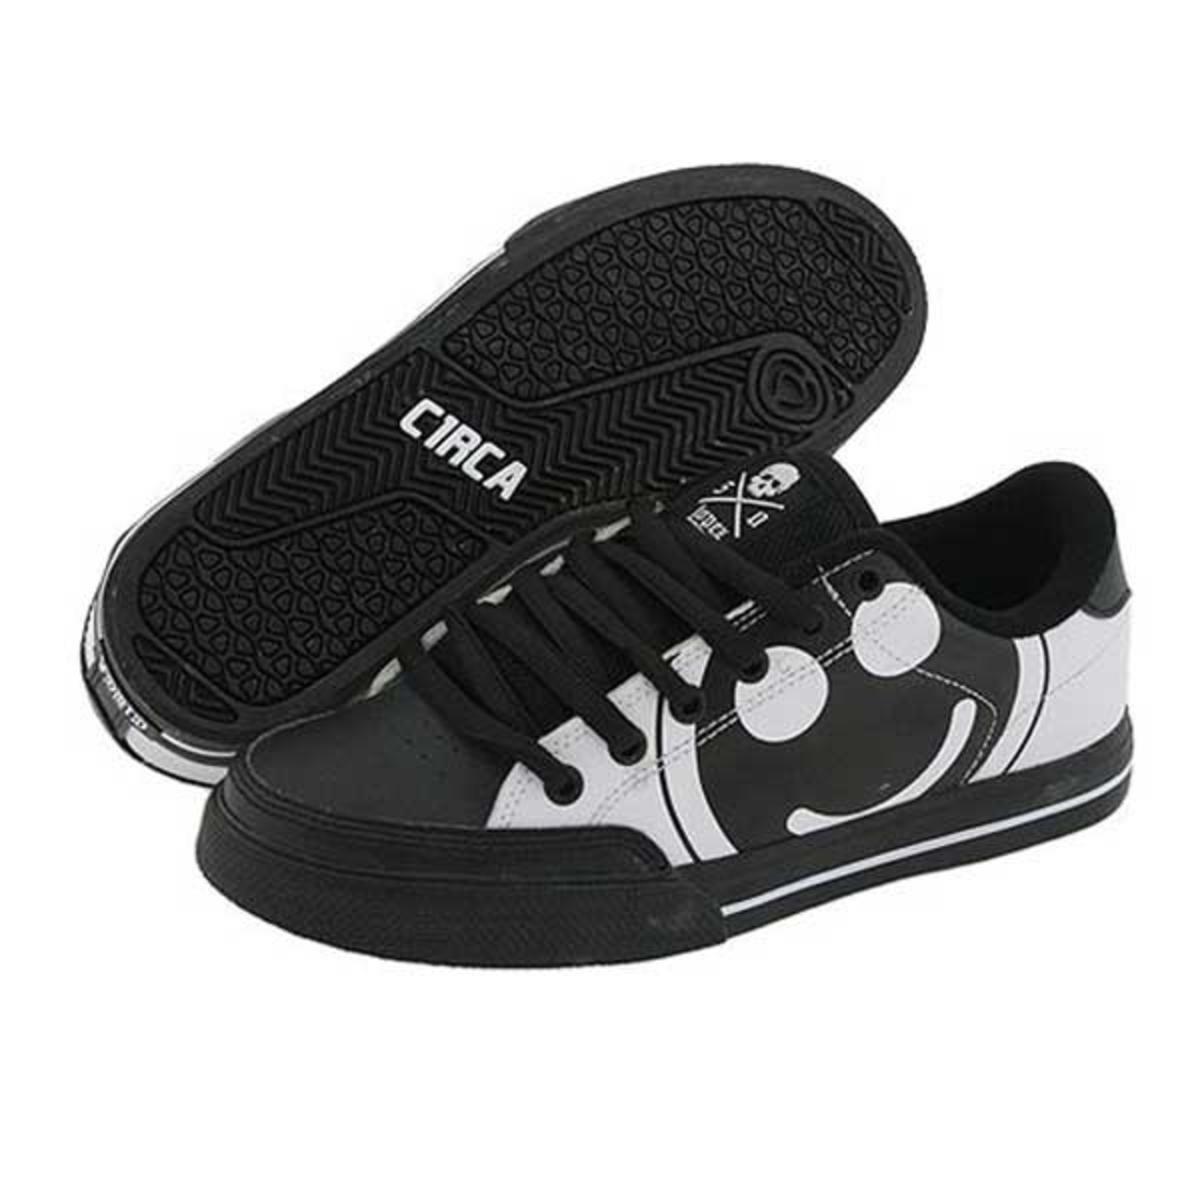 C1RCA Skateboard Schuhe ALK50BWSH schwarz Weiß Super Happy - Circa Kids schuhe